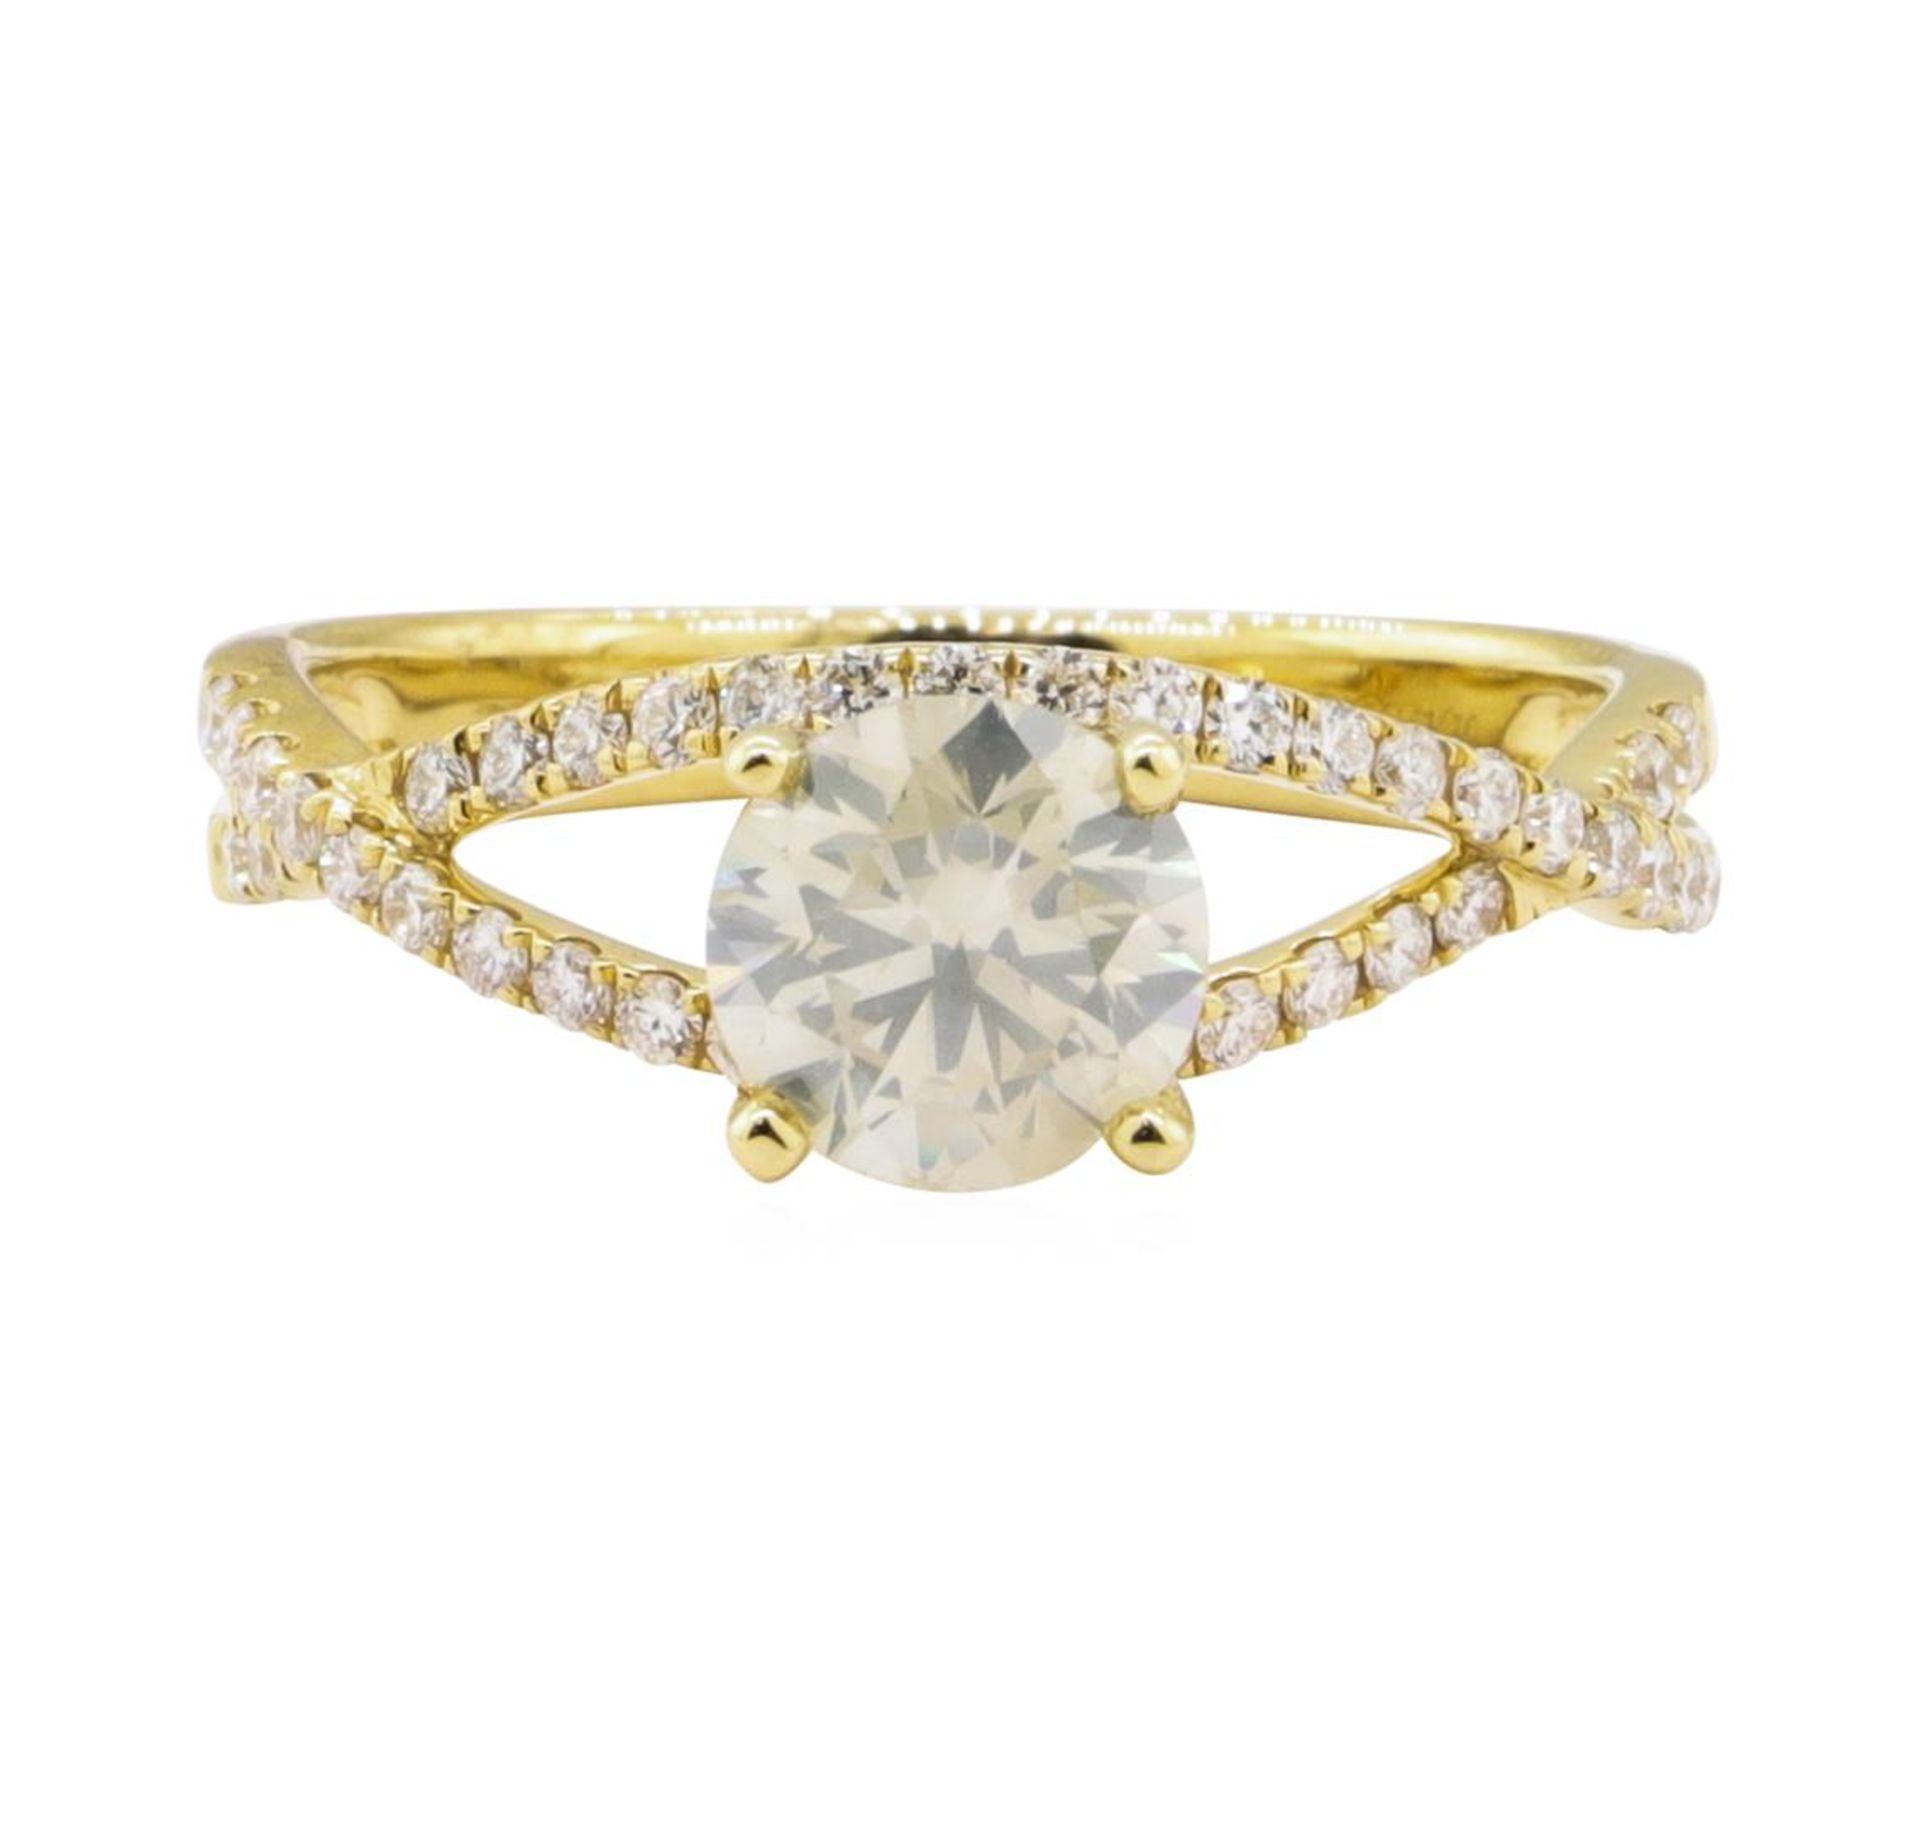 1.04ct Diamond Ring - 18KT Yellow Gold - Image 2 of 5